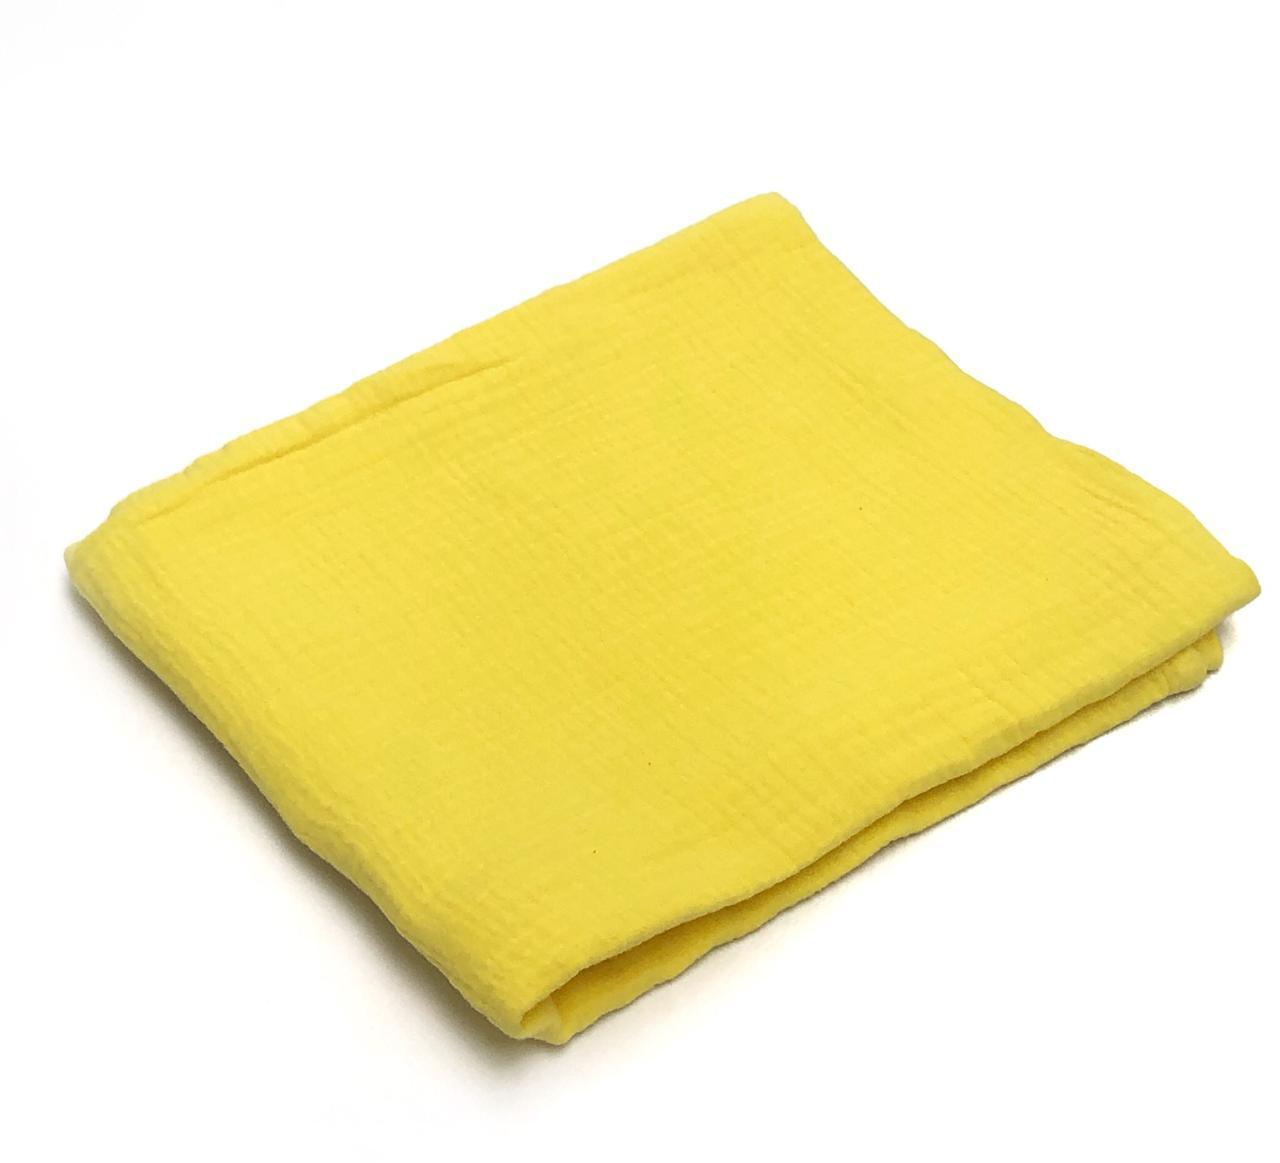 Пеленка муслиновая Жёлтая (100х120 см)